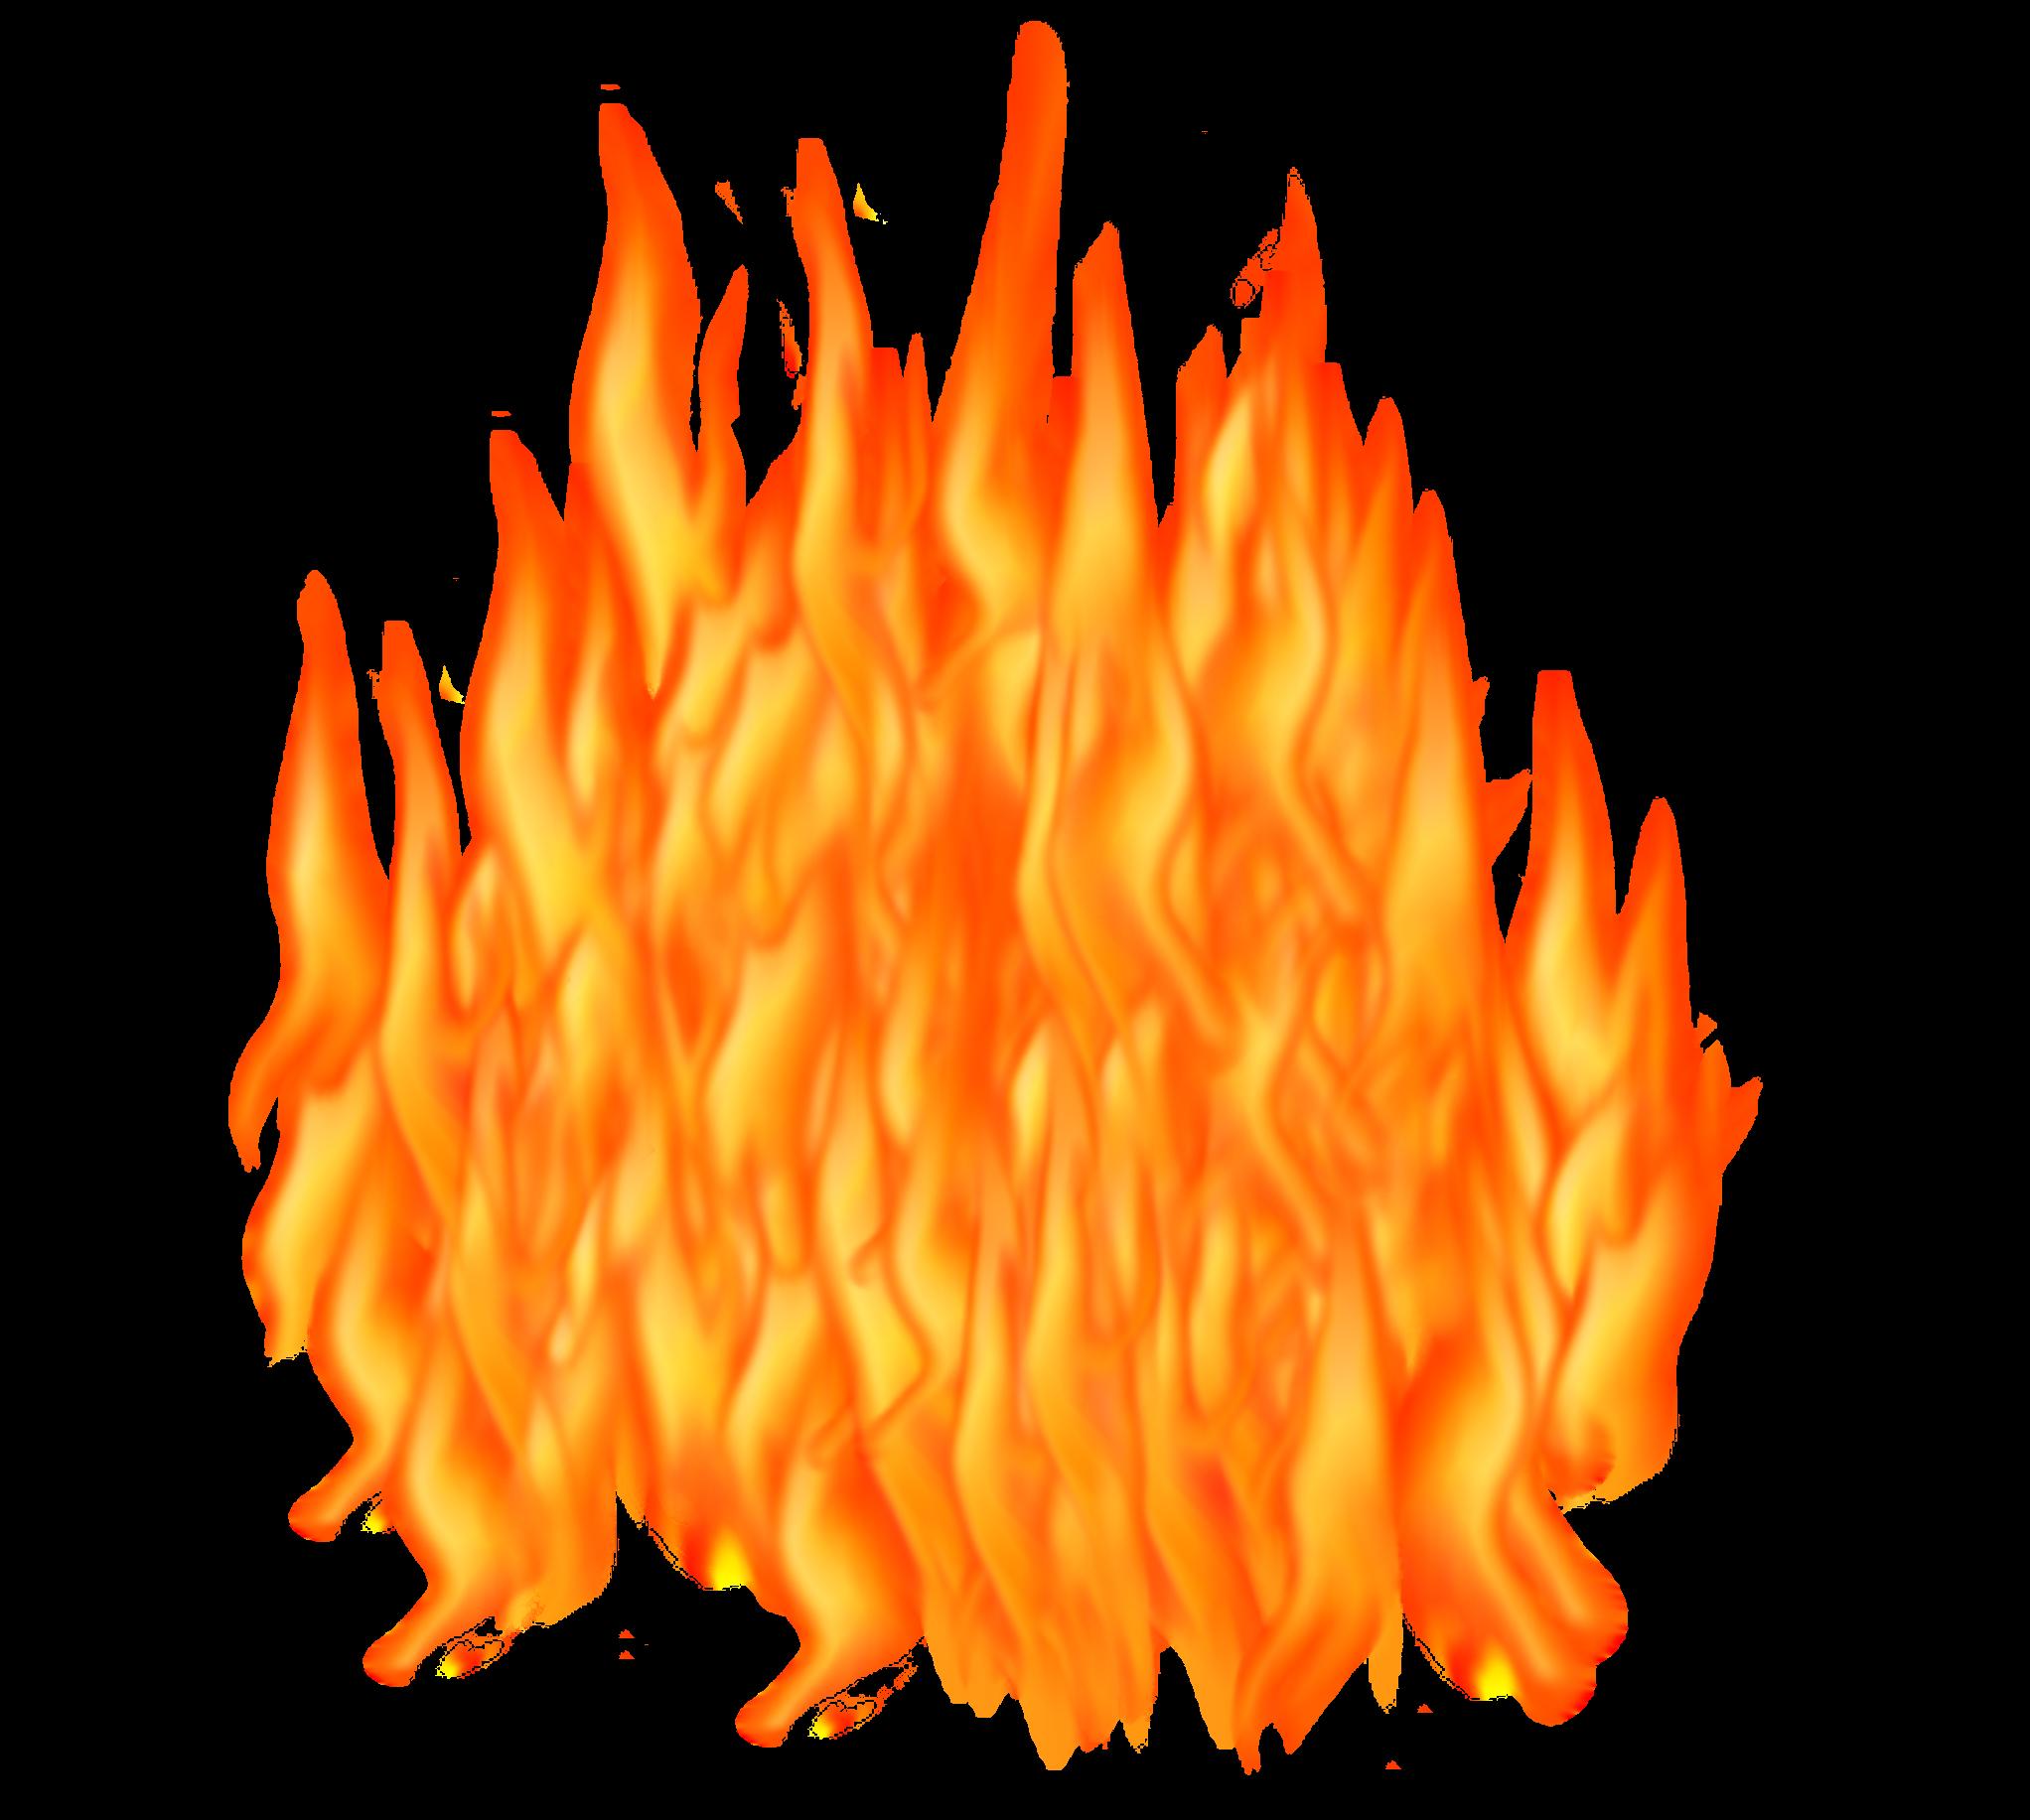 Flames Png - ClipArt Best